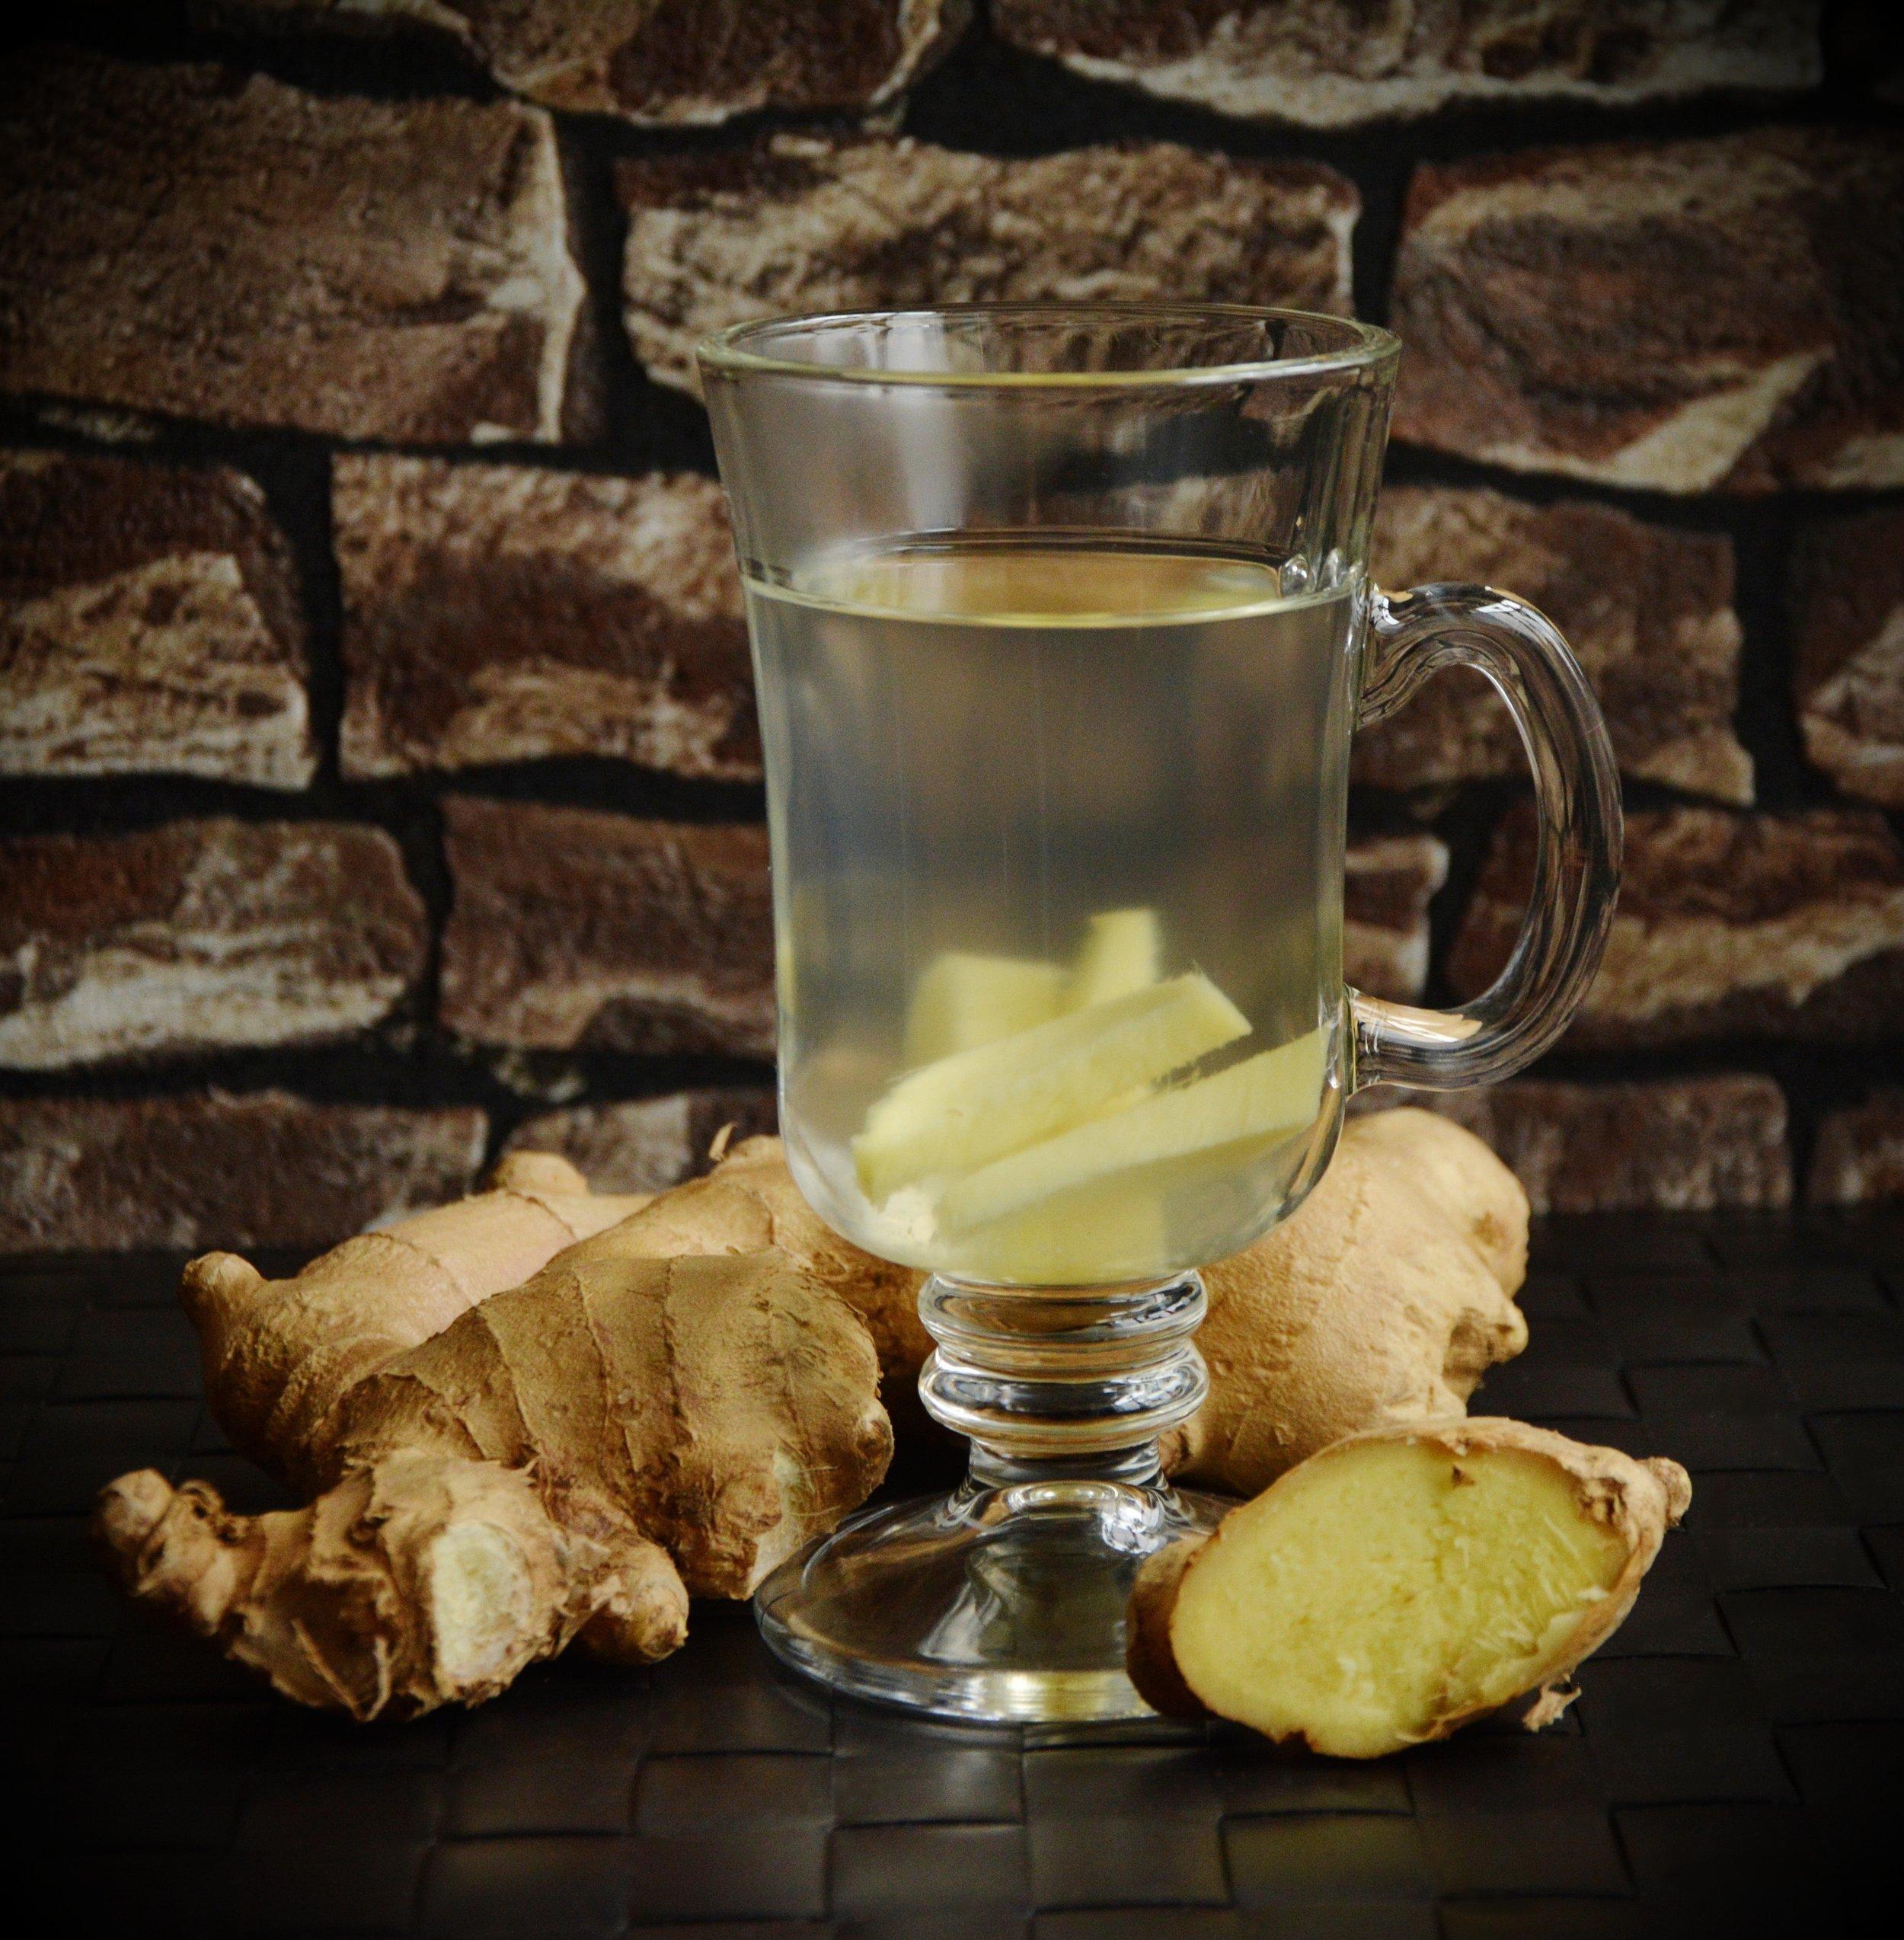 aroma-beverage-cup-206713.jpg